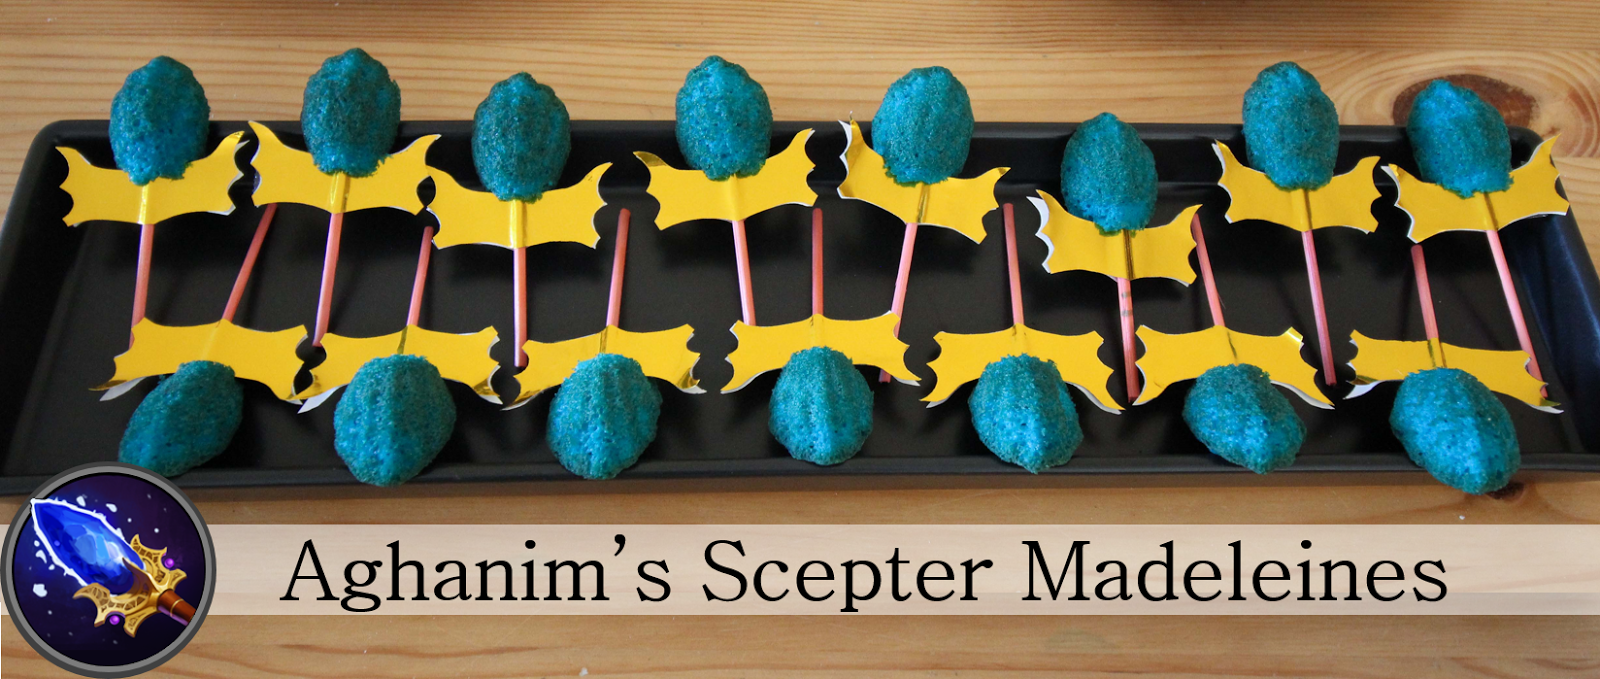 Blue lemon madeleines on decorated kabob sticks look like dota 2 aghanim's scepters.